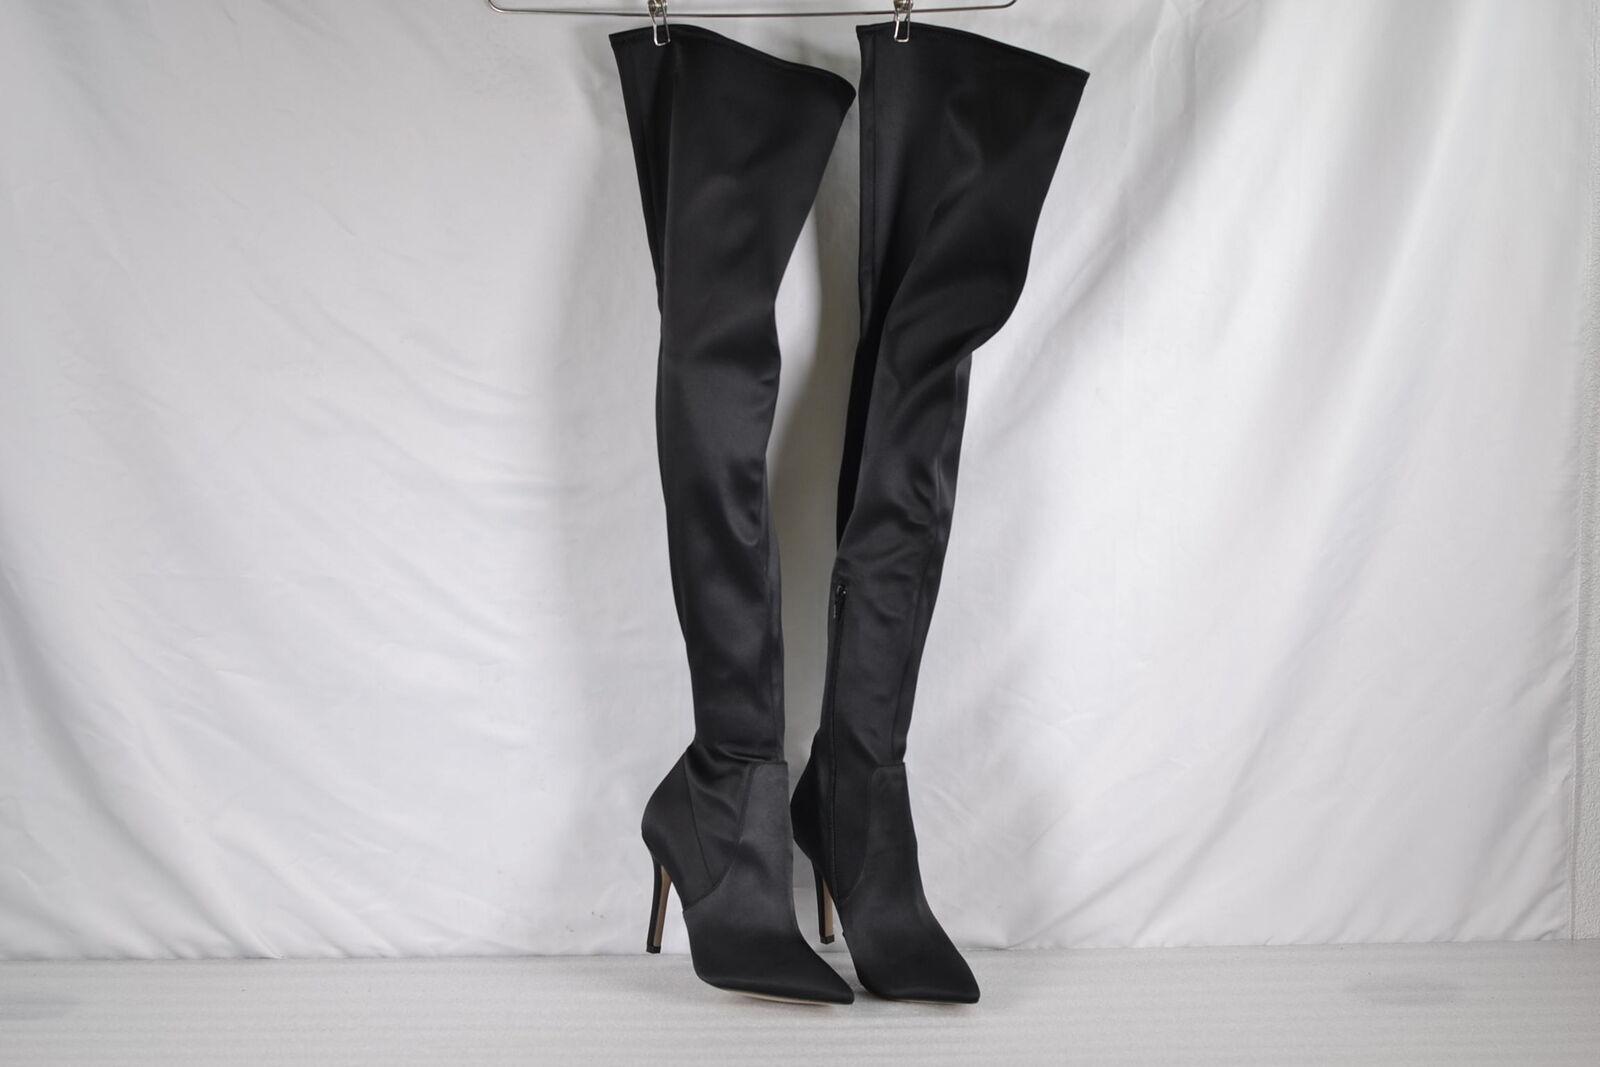 Aldo Sailors Engineer Thigh High Boots